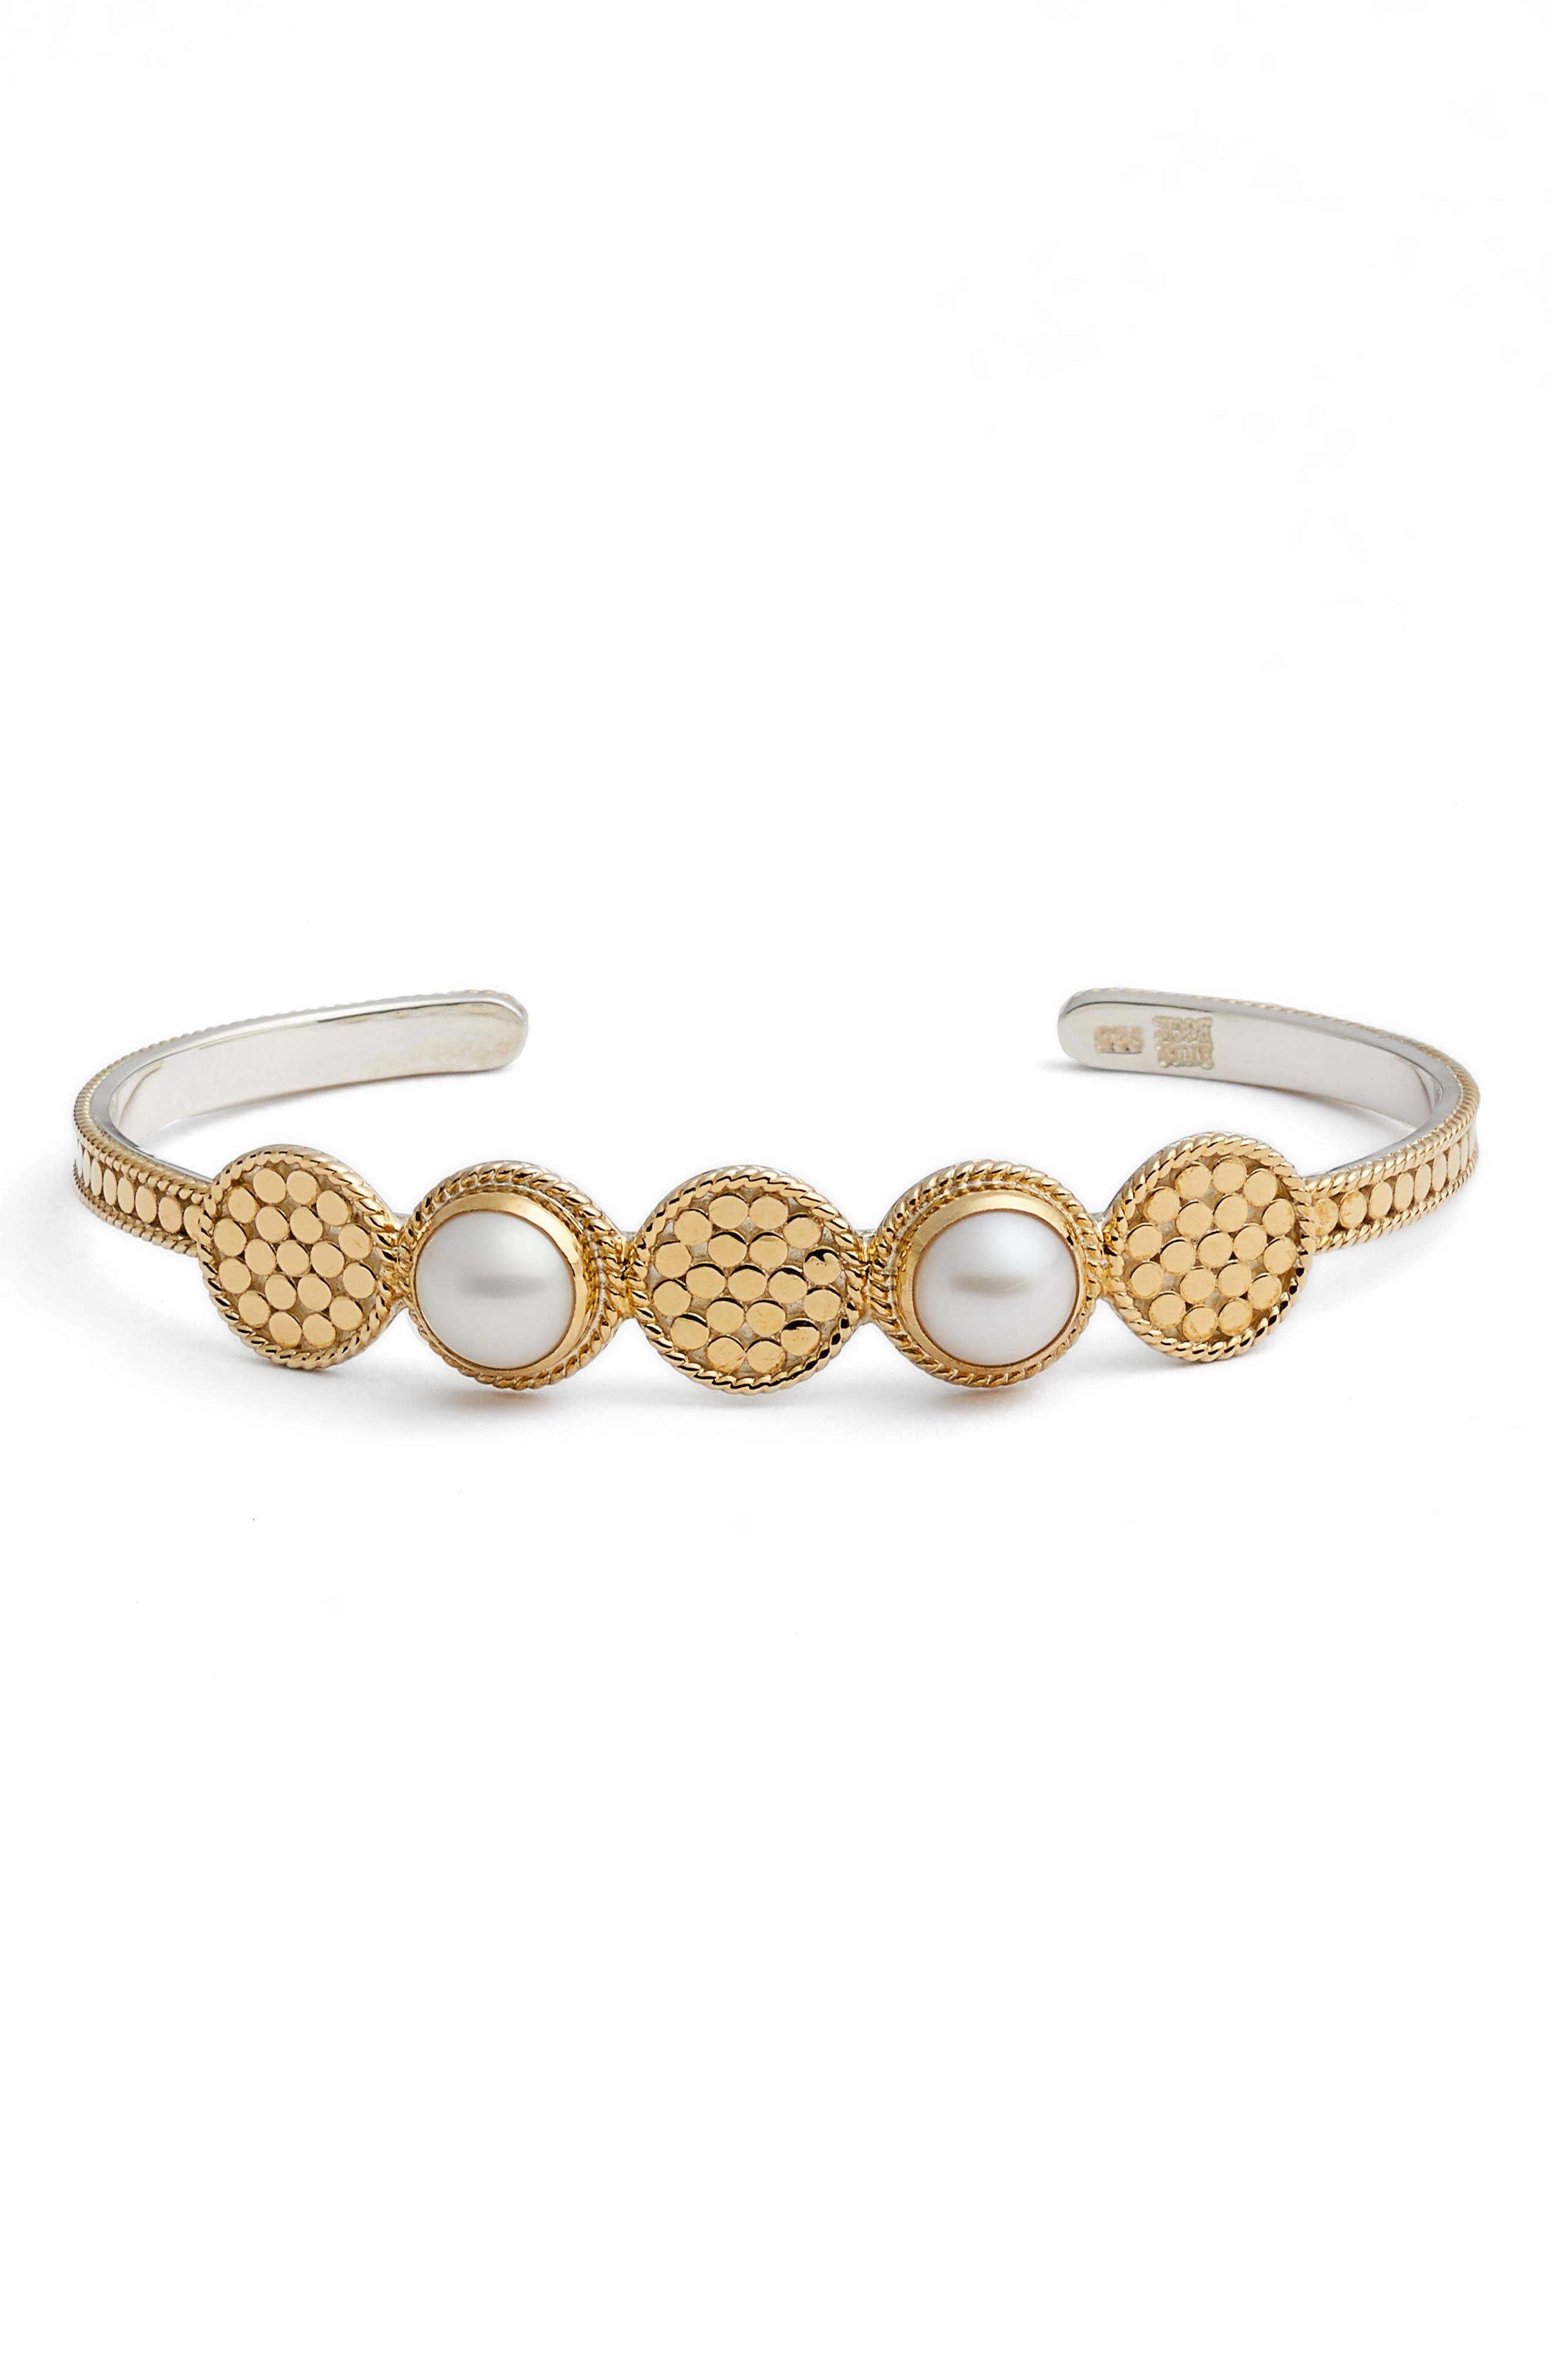 Pearl Multidisc Cuff Bracelet,                         Main,                         color, GOLD/ PEARL